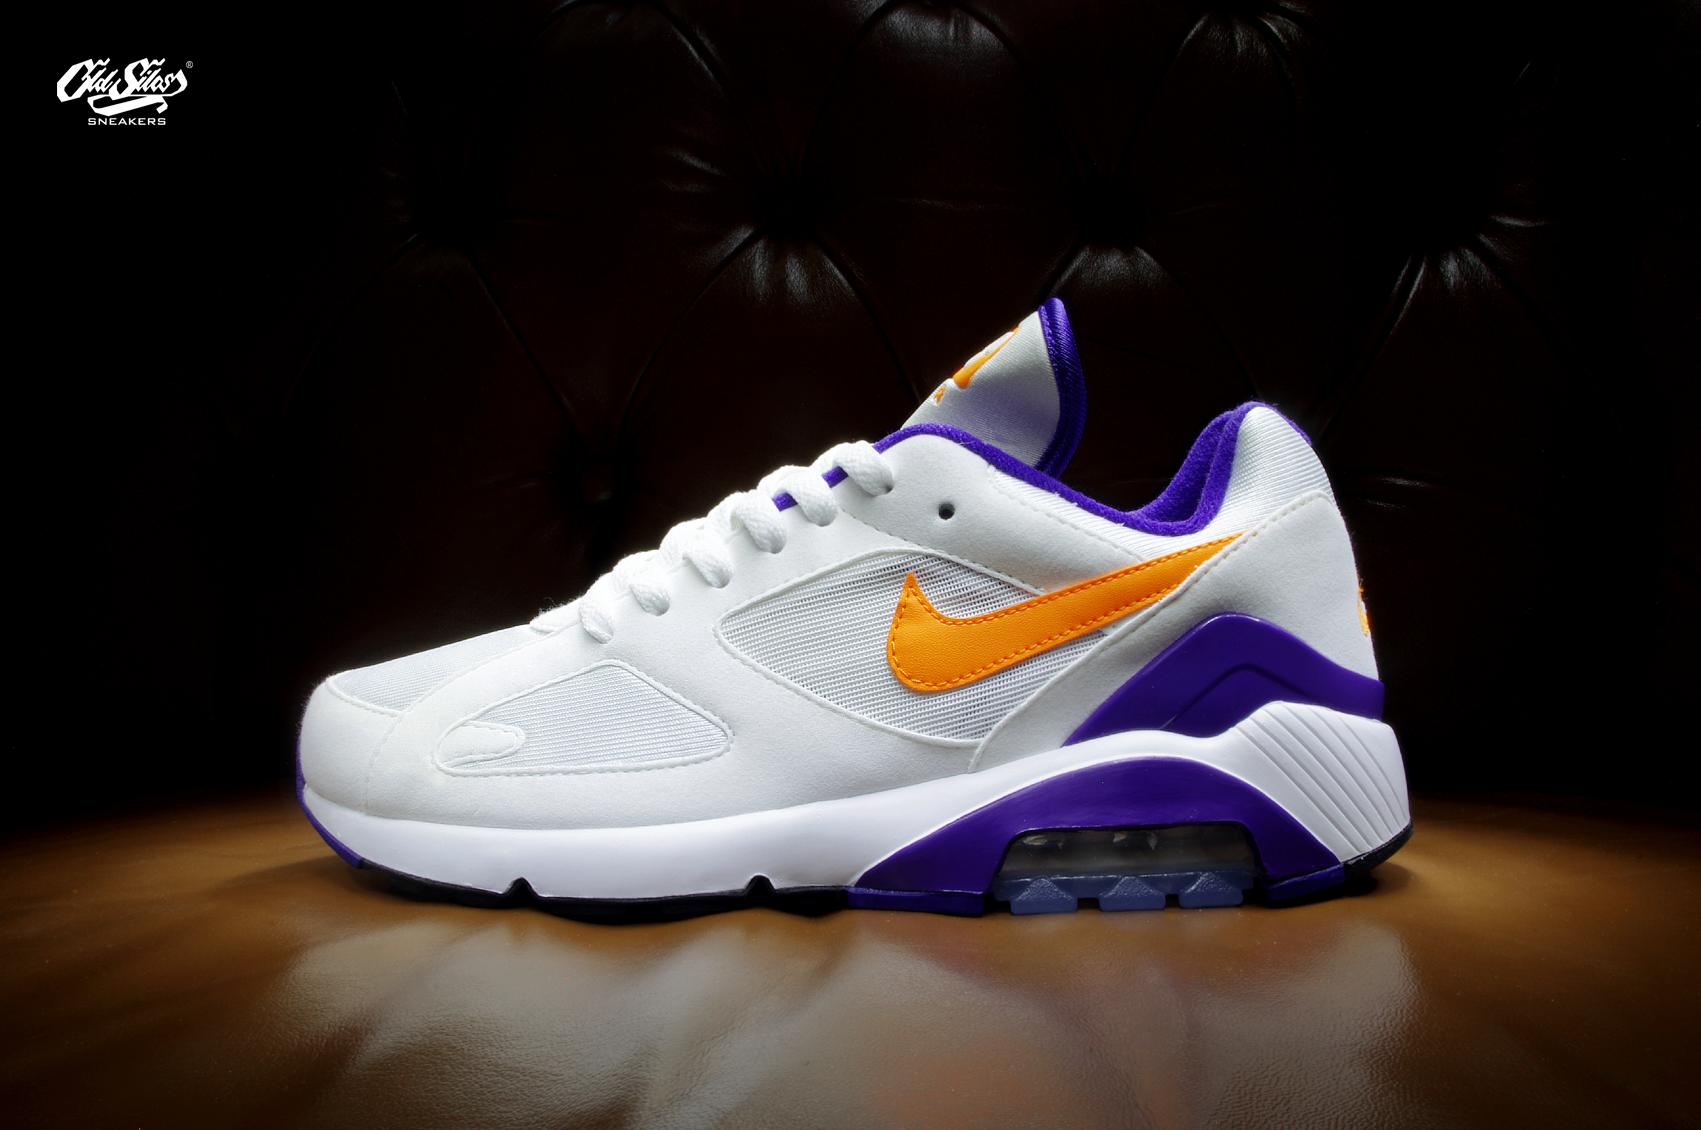 Nike Air Max 180 615287 101 WHITE BRIGHT CERAMIC DARK